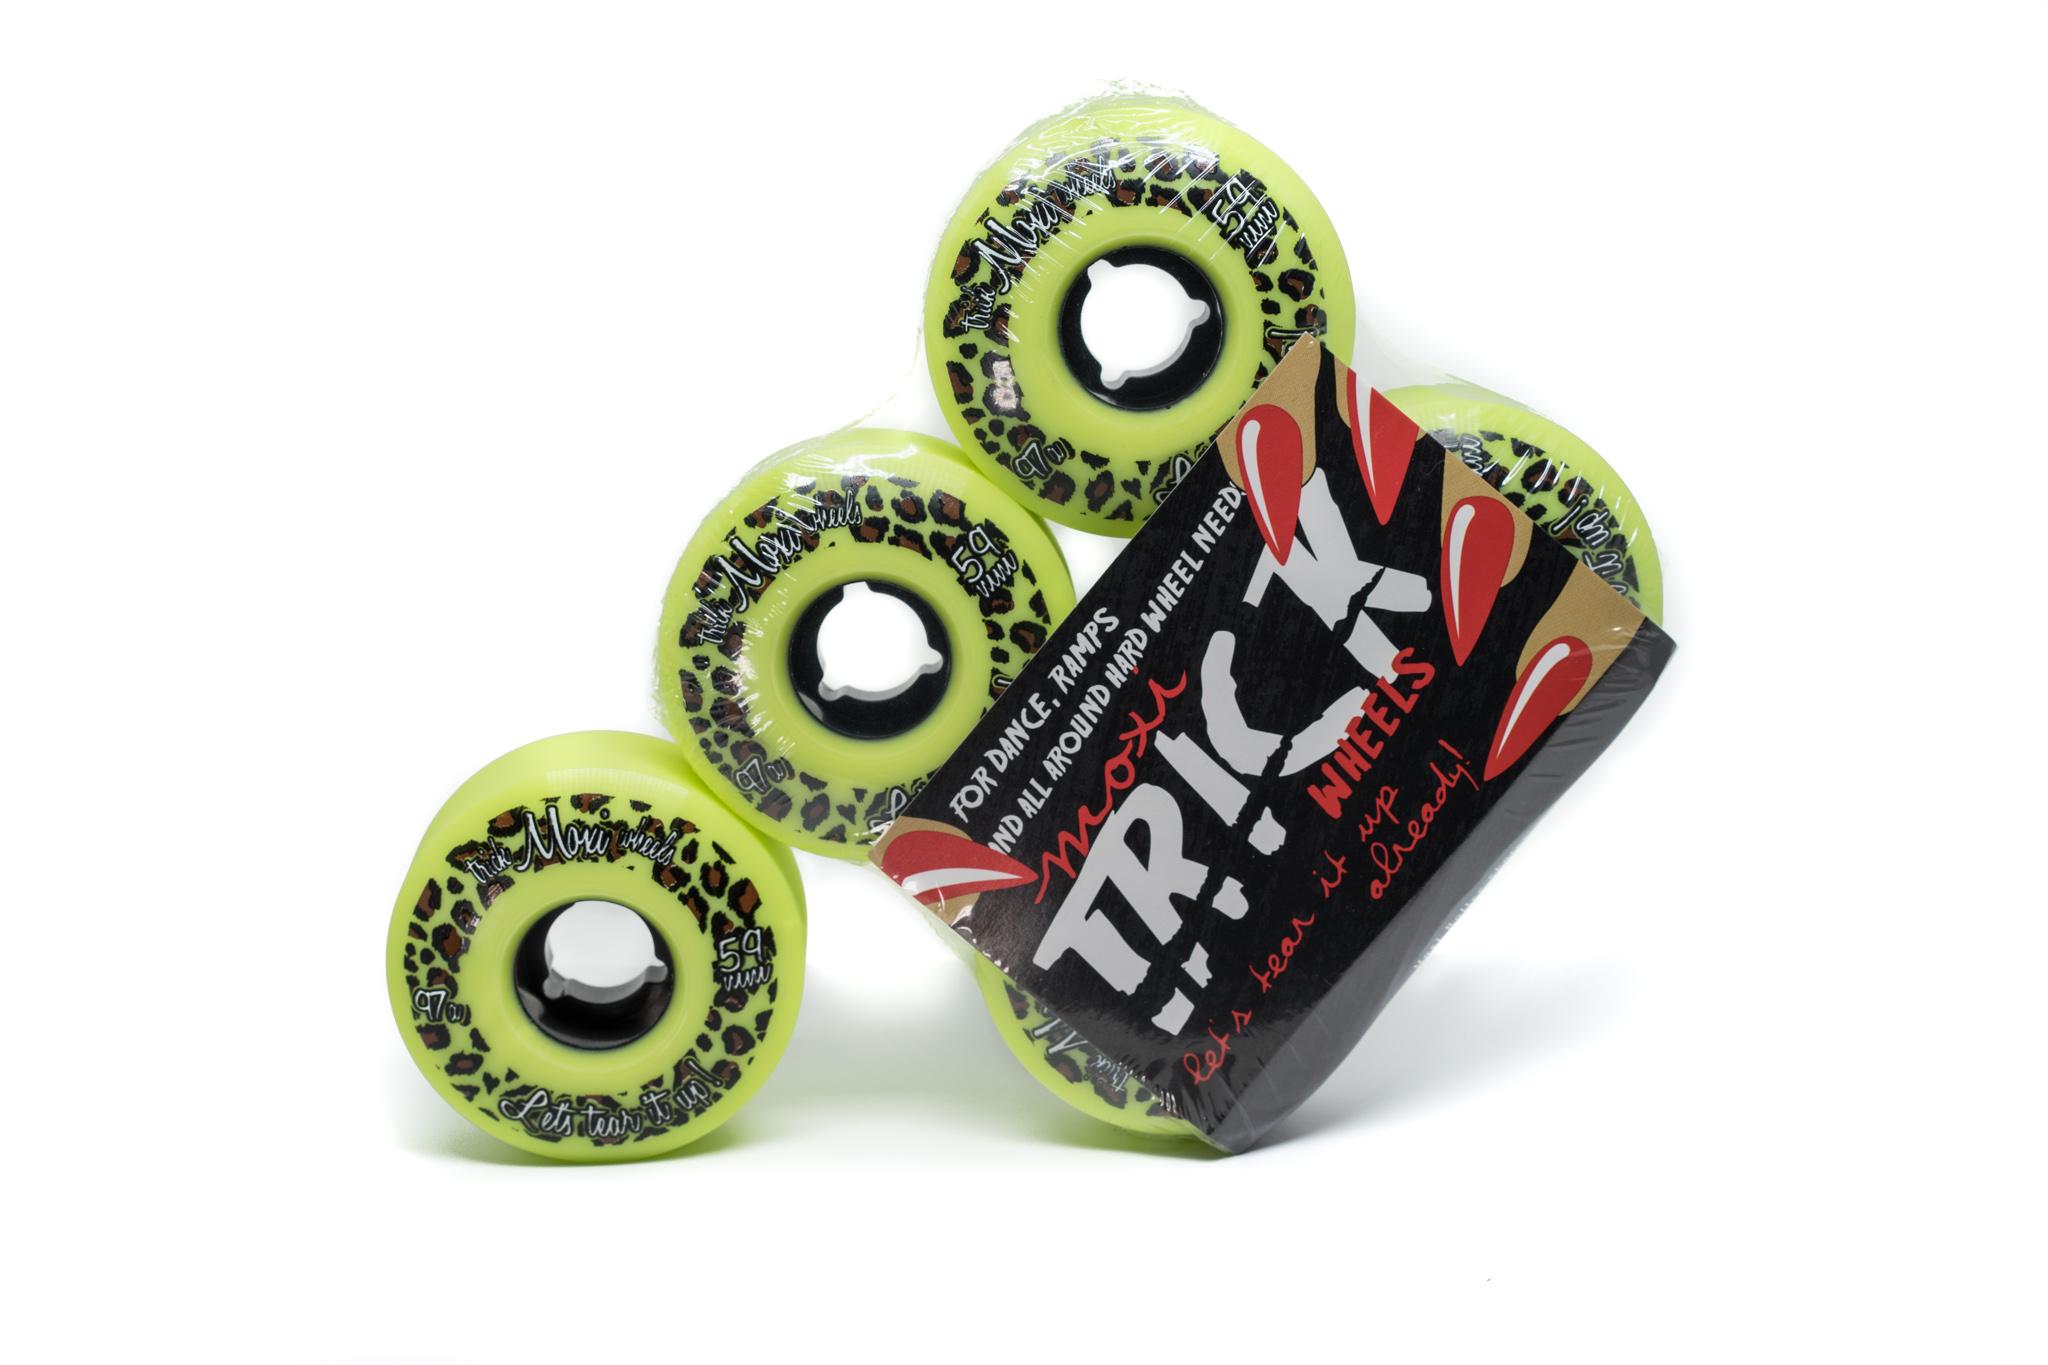 moxi-trick-wheels-59mm-green-2.jpg